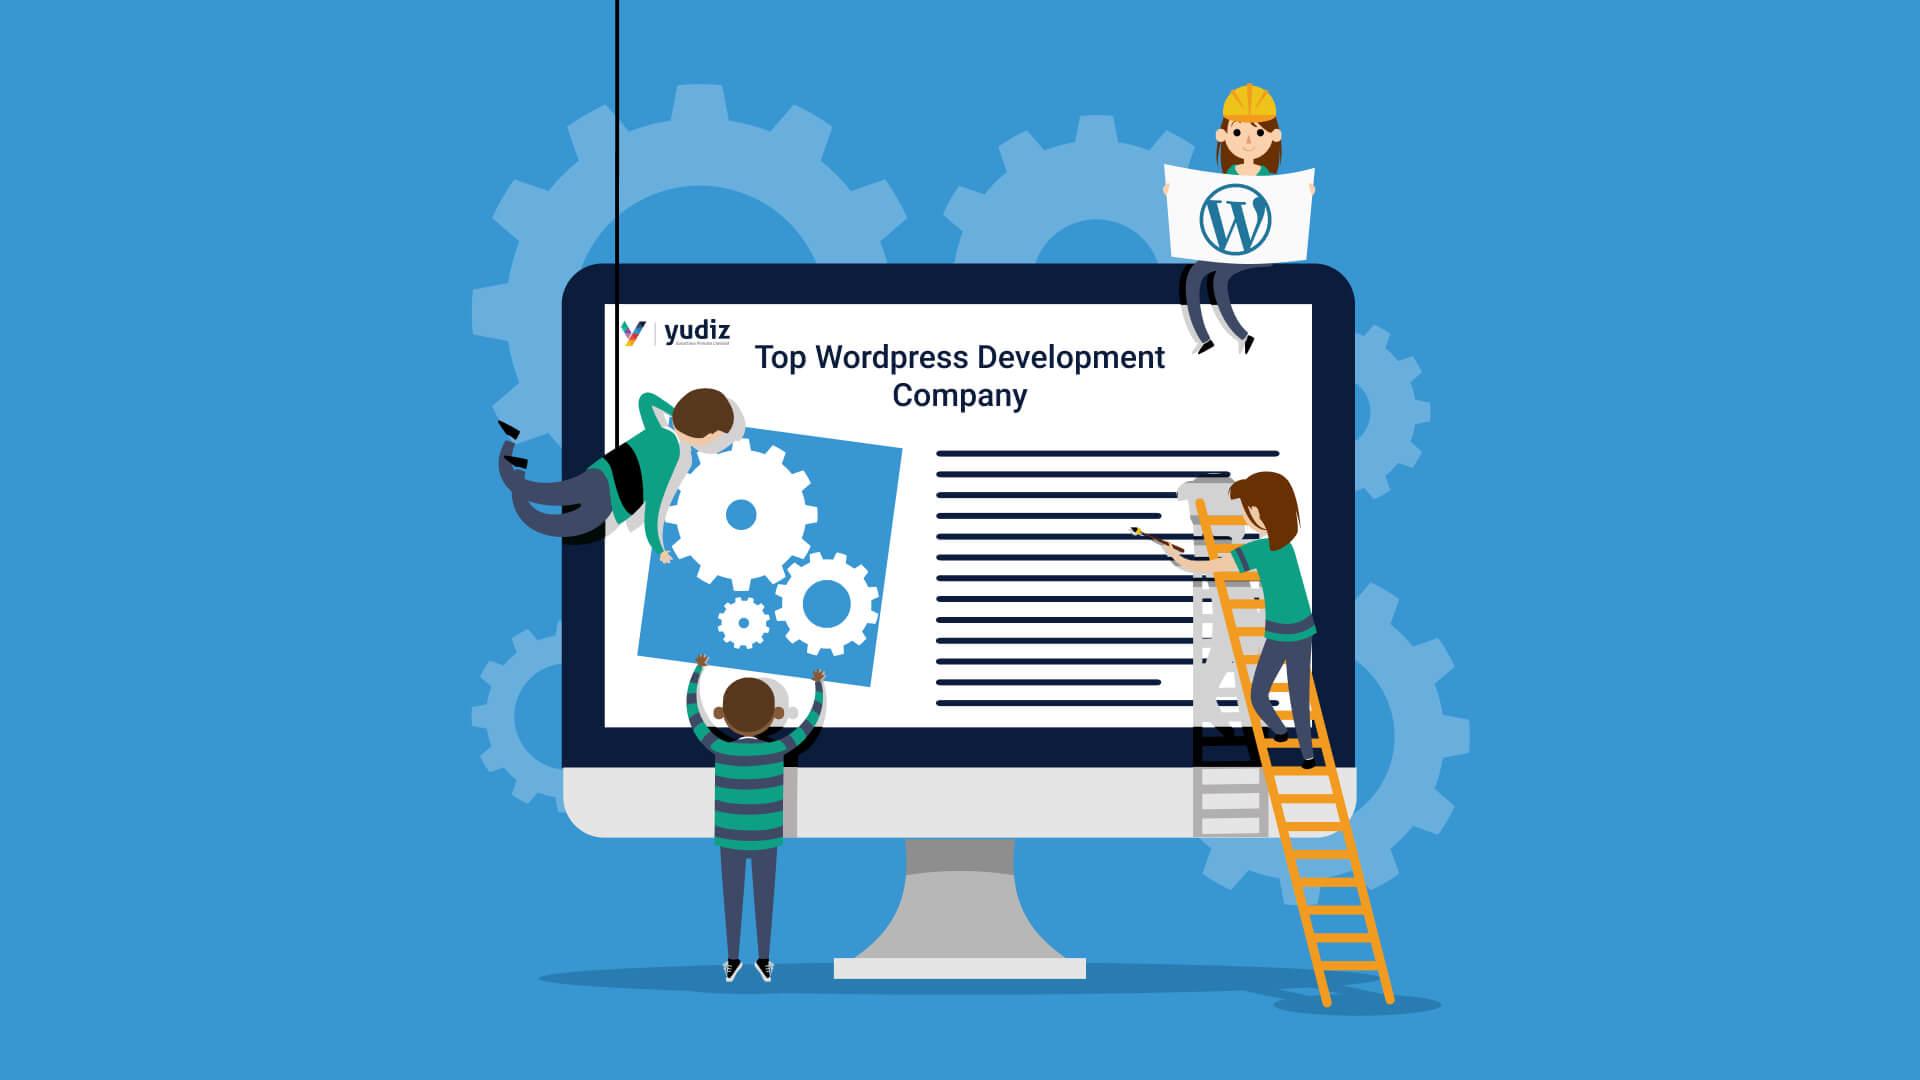 Yudiz declared as a top WordPress Development Company of January 2021